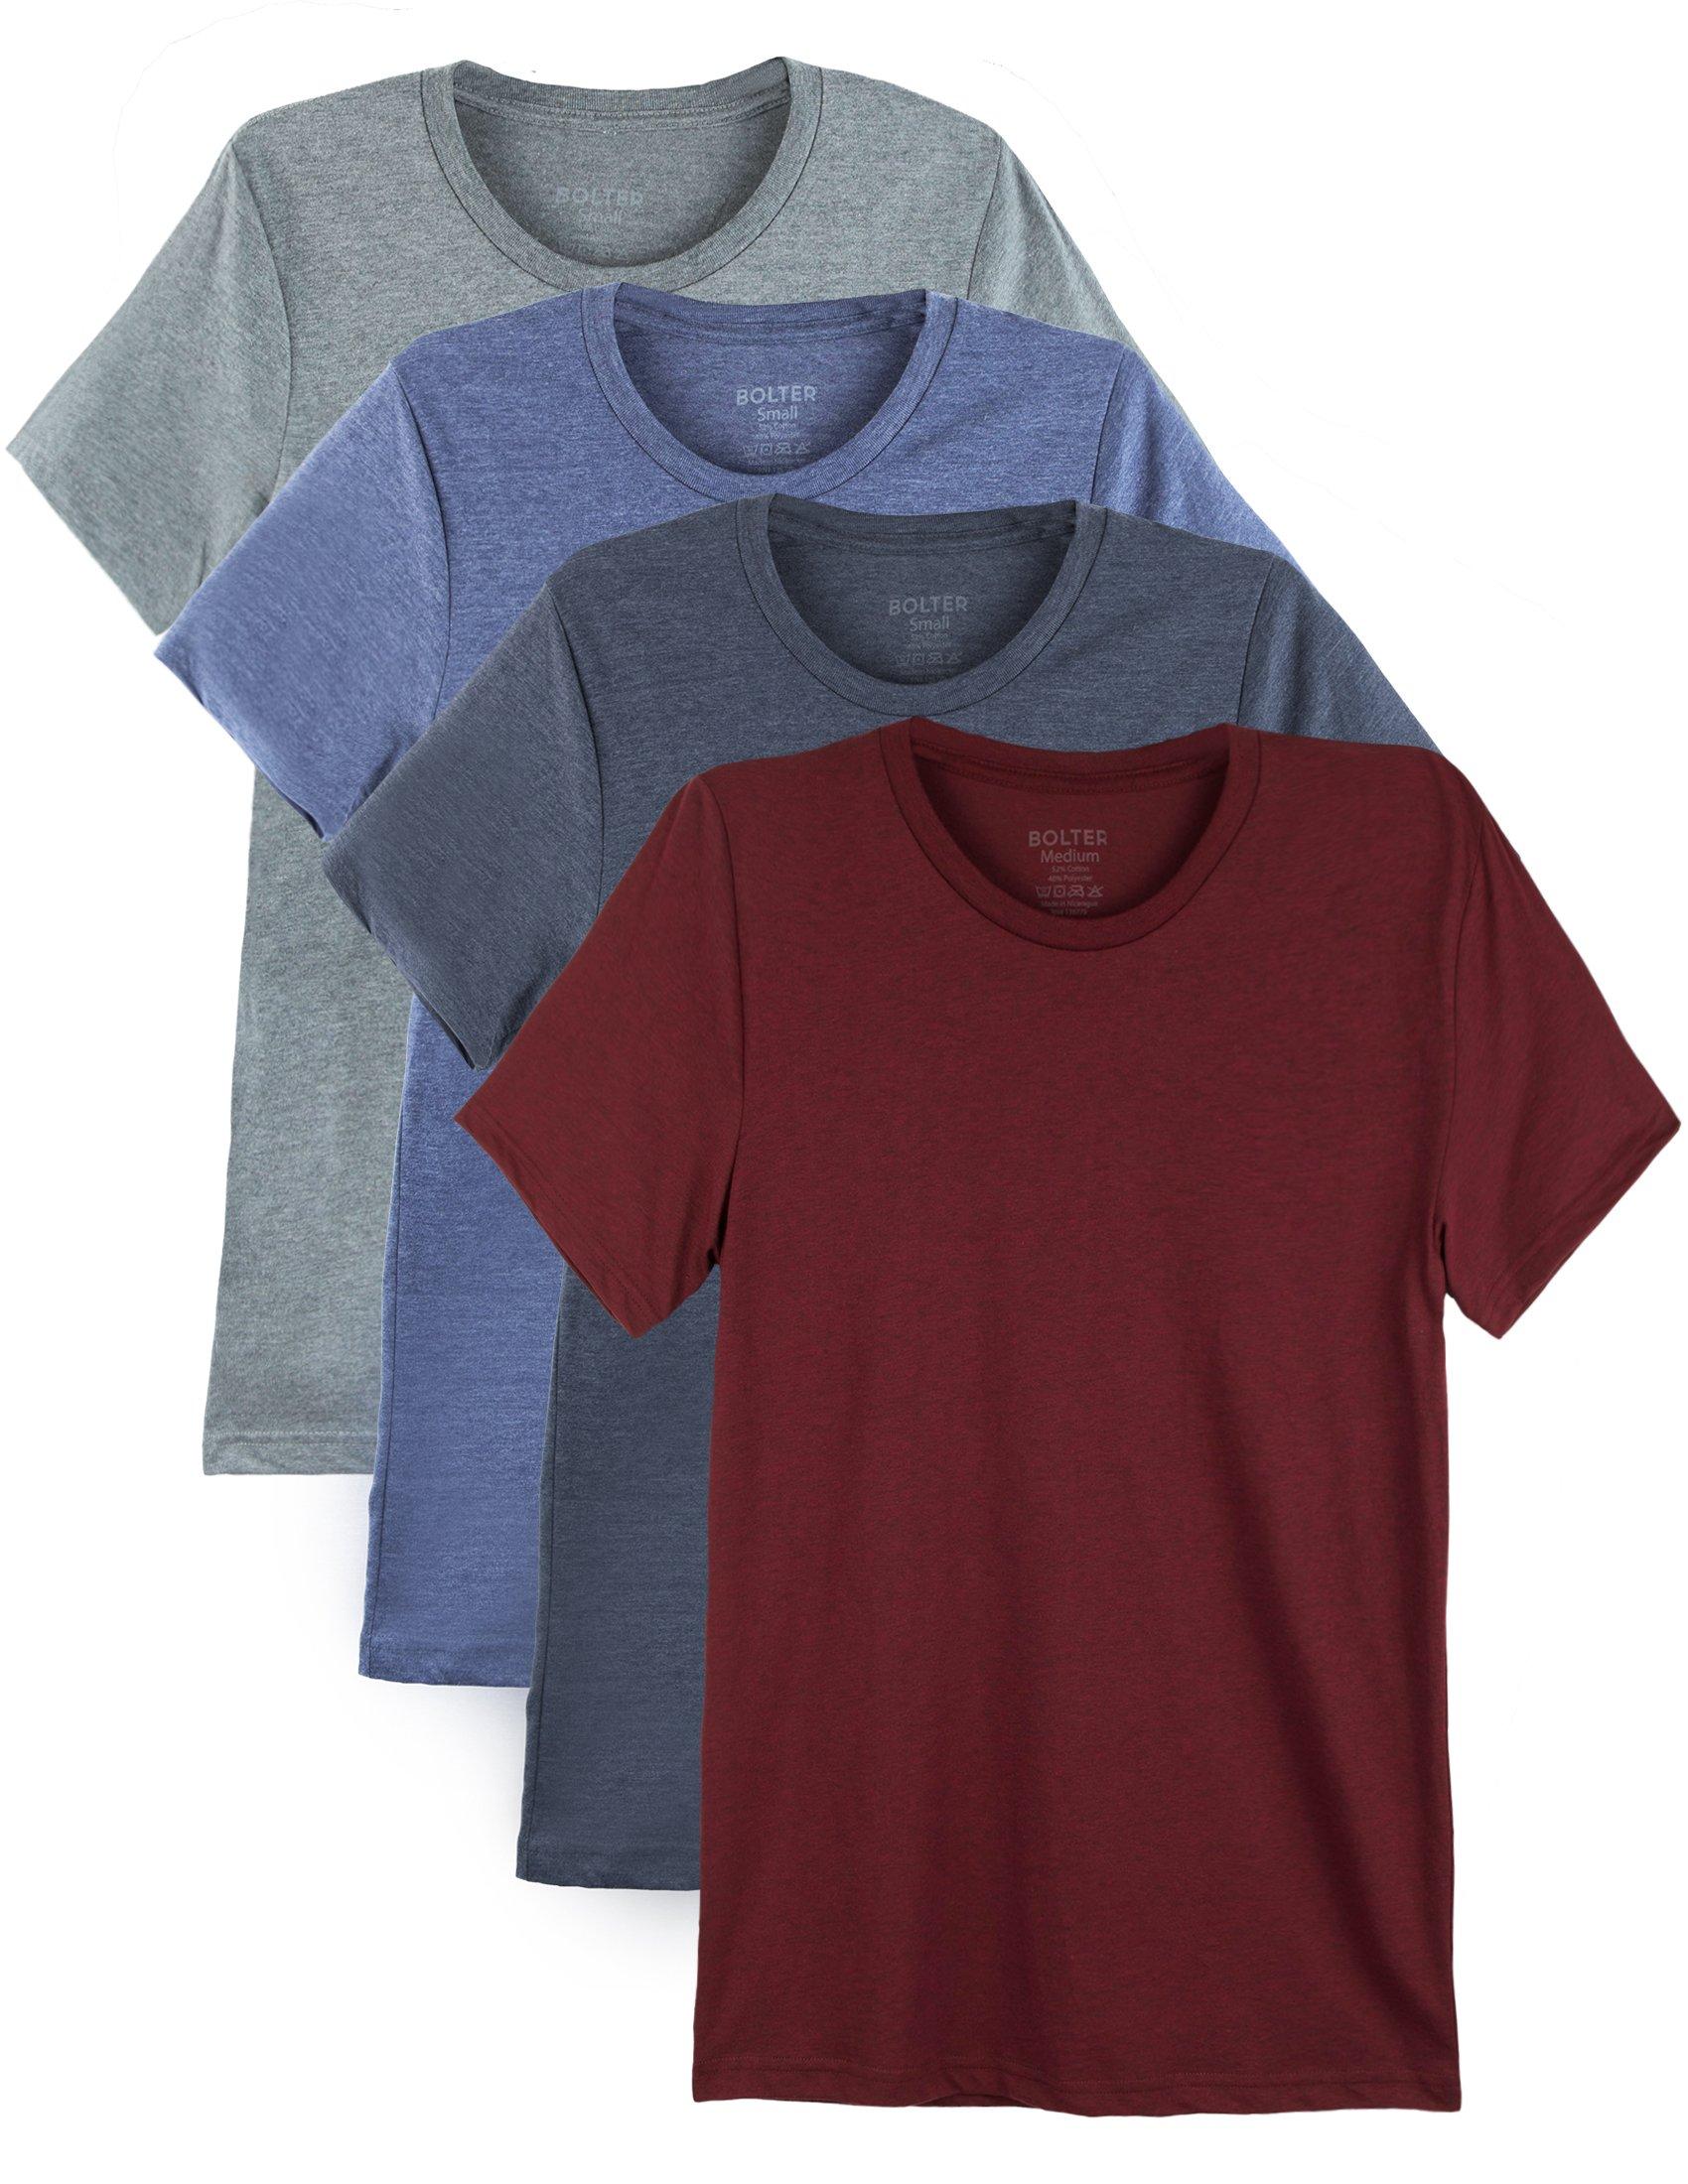 Bolter 4 Pack Men's Everyday Cotton Blend Short Sleeve T-Shirt (Large, H.Car/H.Roy/H.NVY/H.Slt)